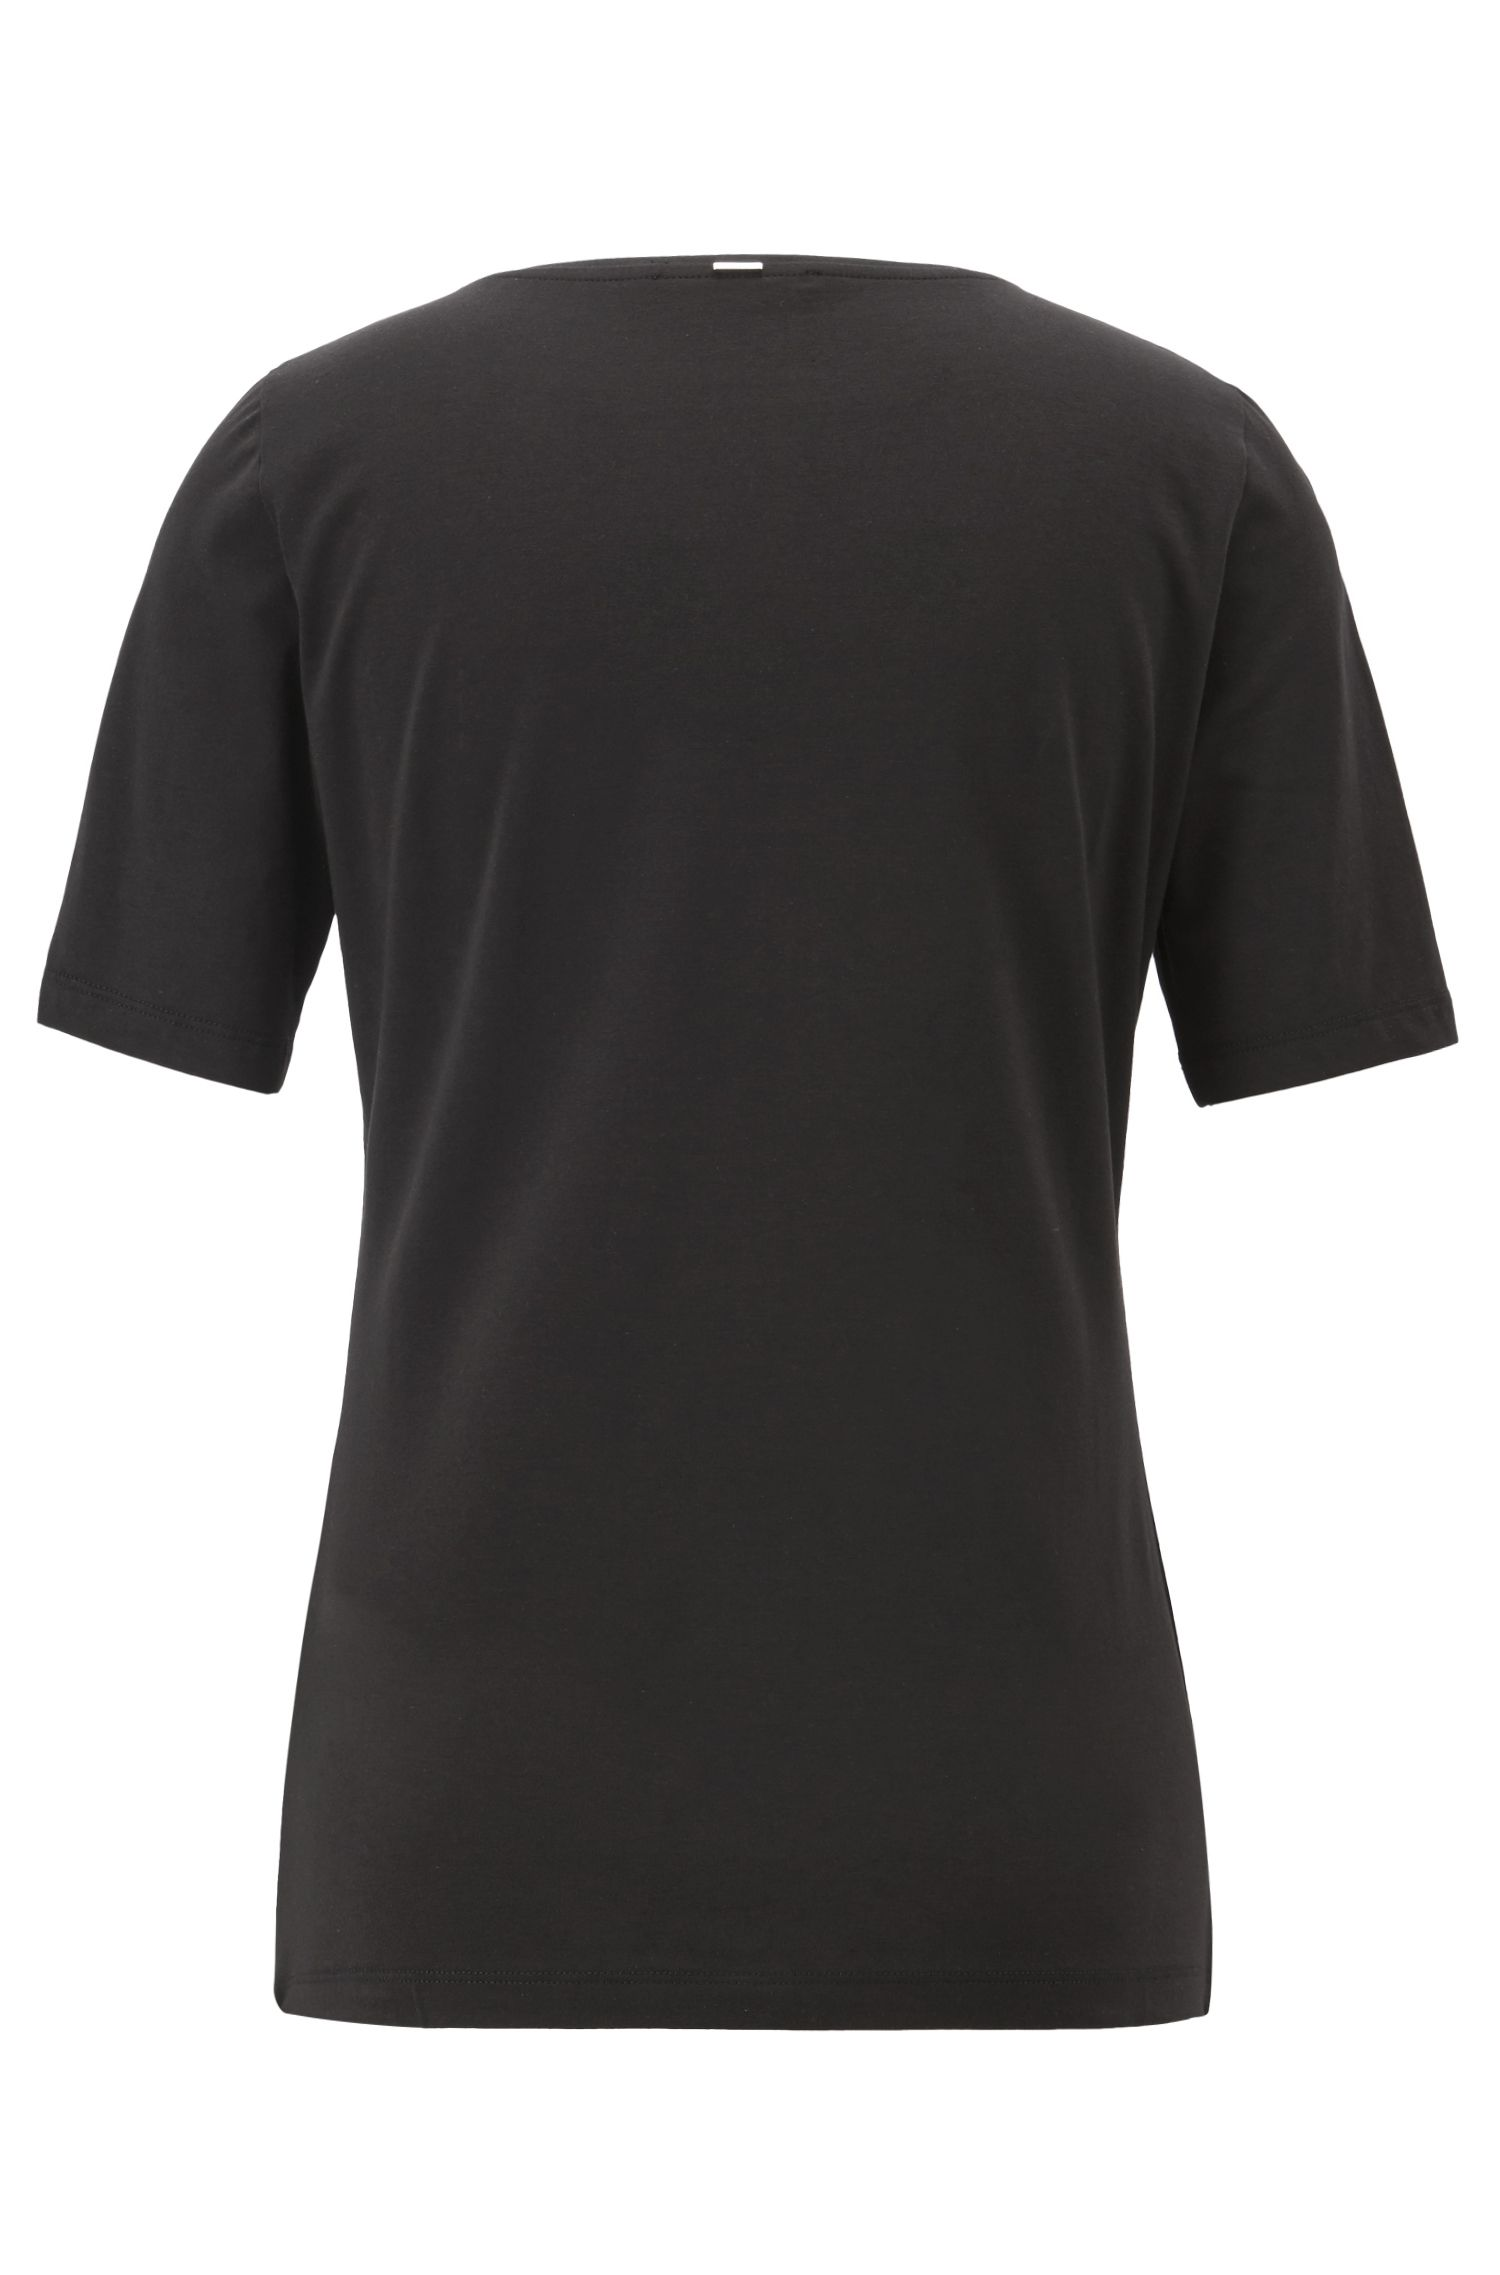 Jersey-Top mit Seidenbesatz am Ausschnitt, Schwarz